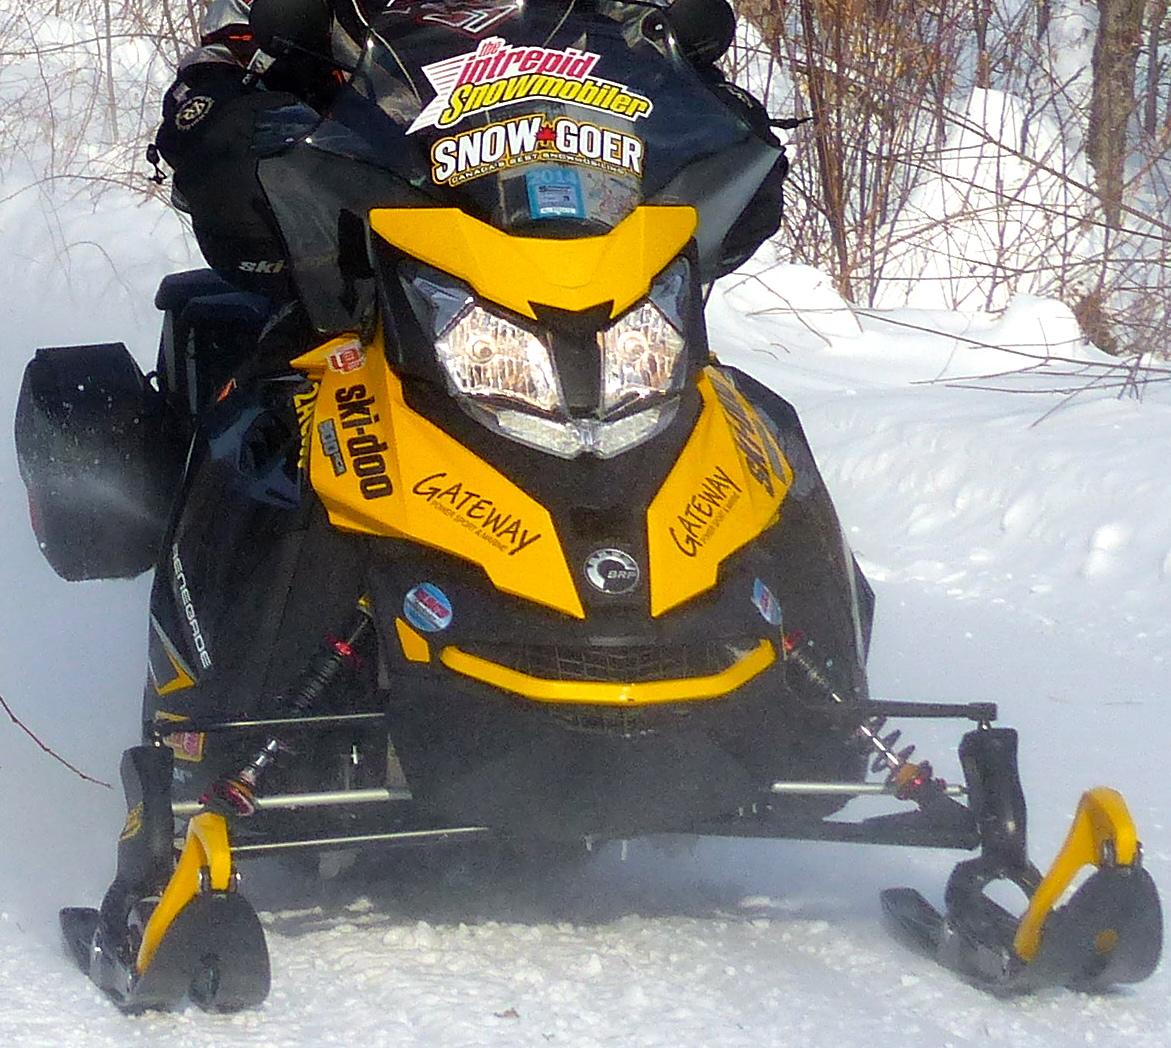 Ski-Doo Snowmobiles Top Reasons To Ride Them